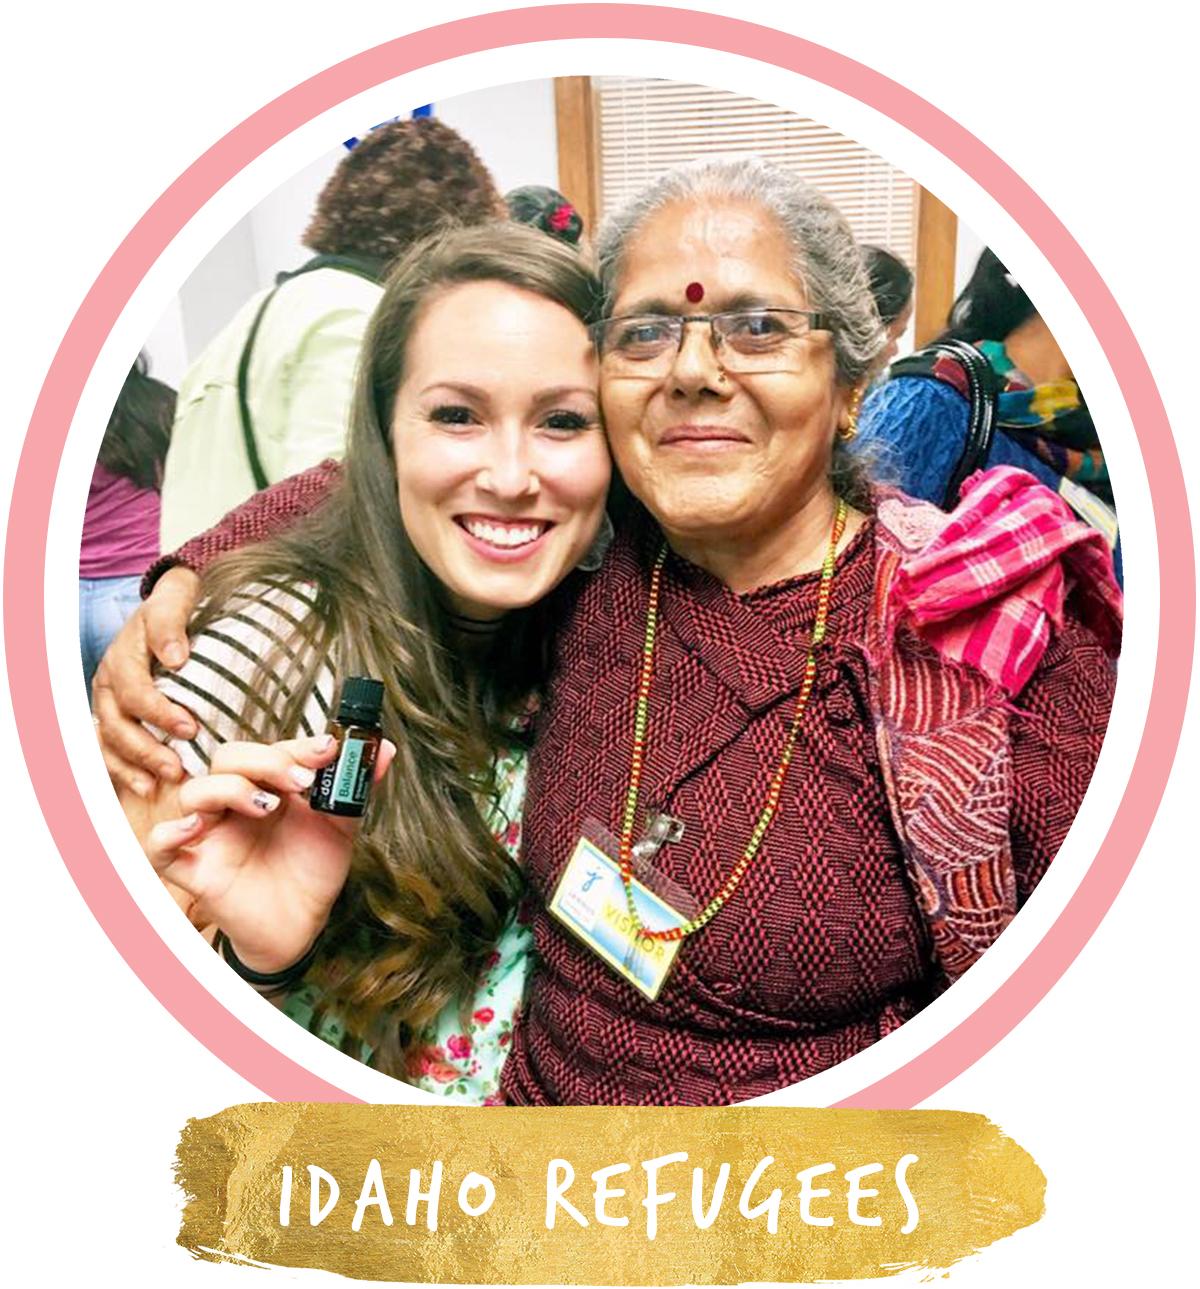 idaho refugees.jpg